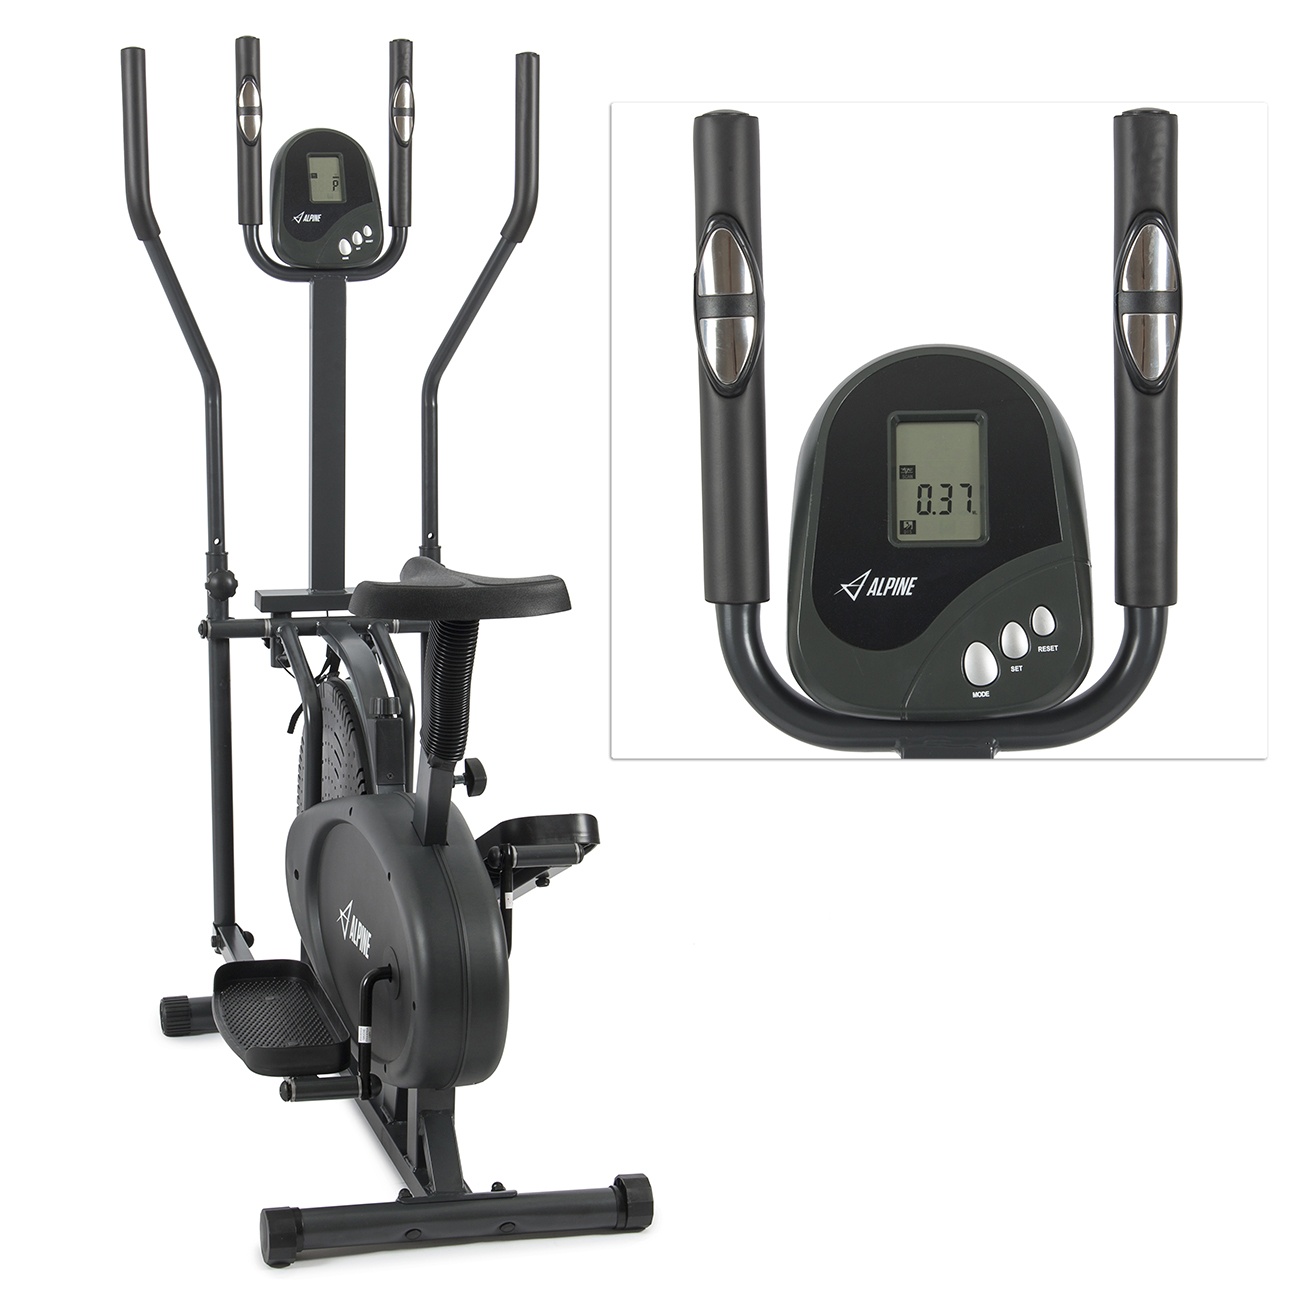 2 in 1 exercise machine